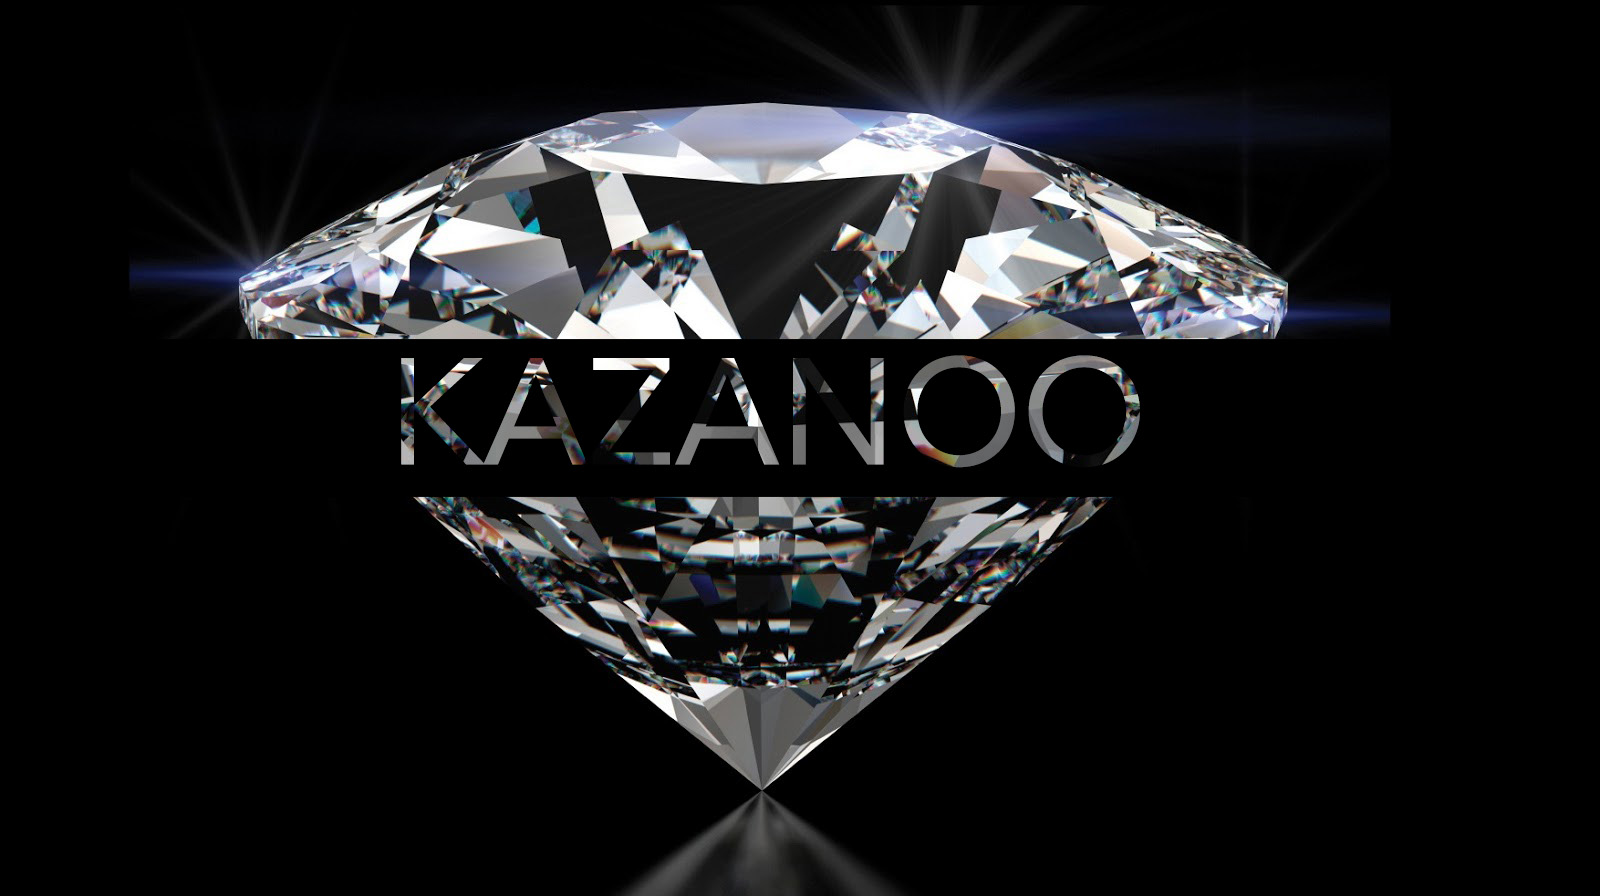 Kazanoo